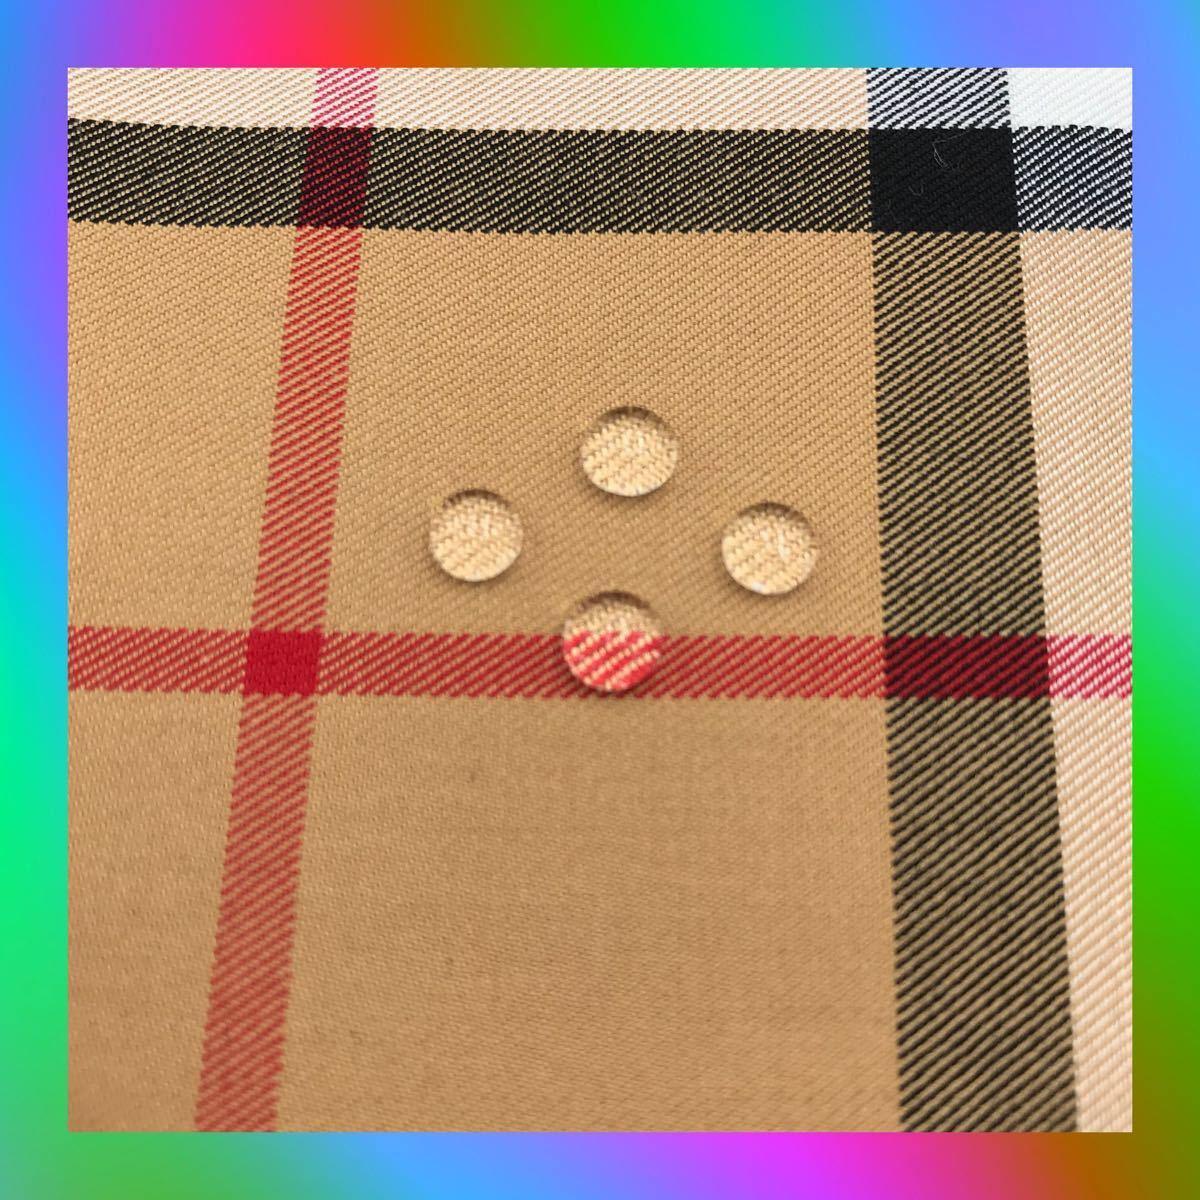 AAA 褐色 大格子 撥水加工 半分サイズ タータンチェック 格子柄 パッチワーク ハンドメイド  生地 チェック はぎれ 綿